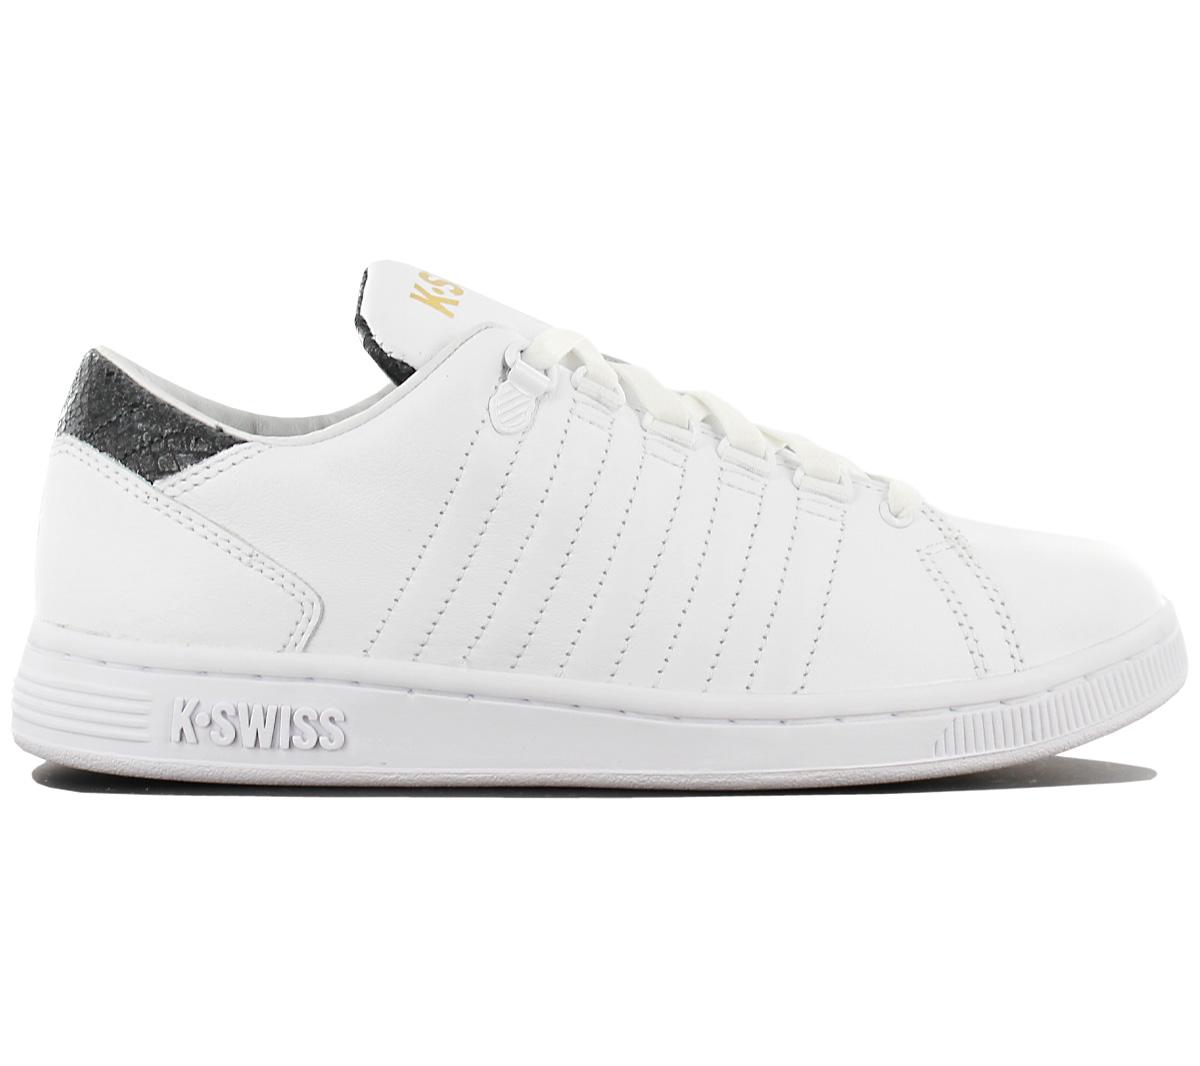 404d9221b3b K-Swiss Lozan III Tt Tongue Twister Ladies Sneaker Shoes Leather ...